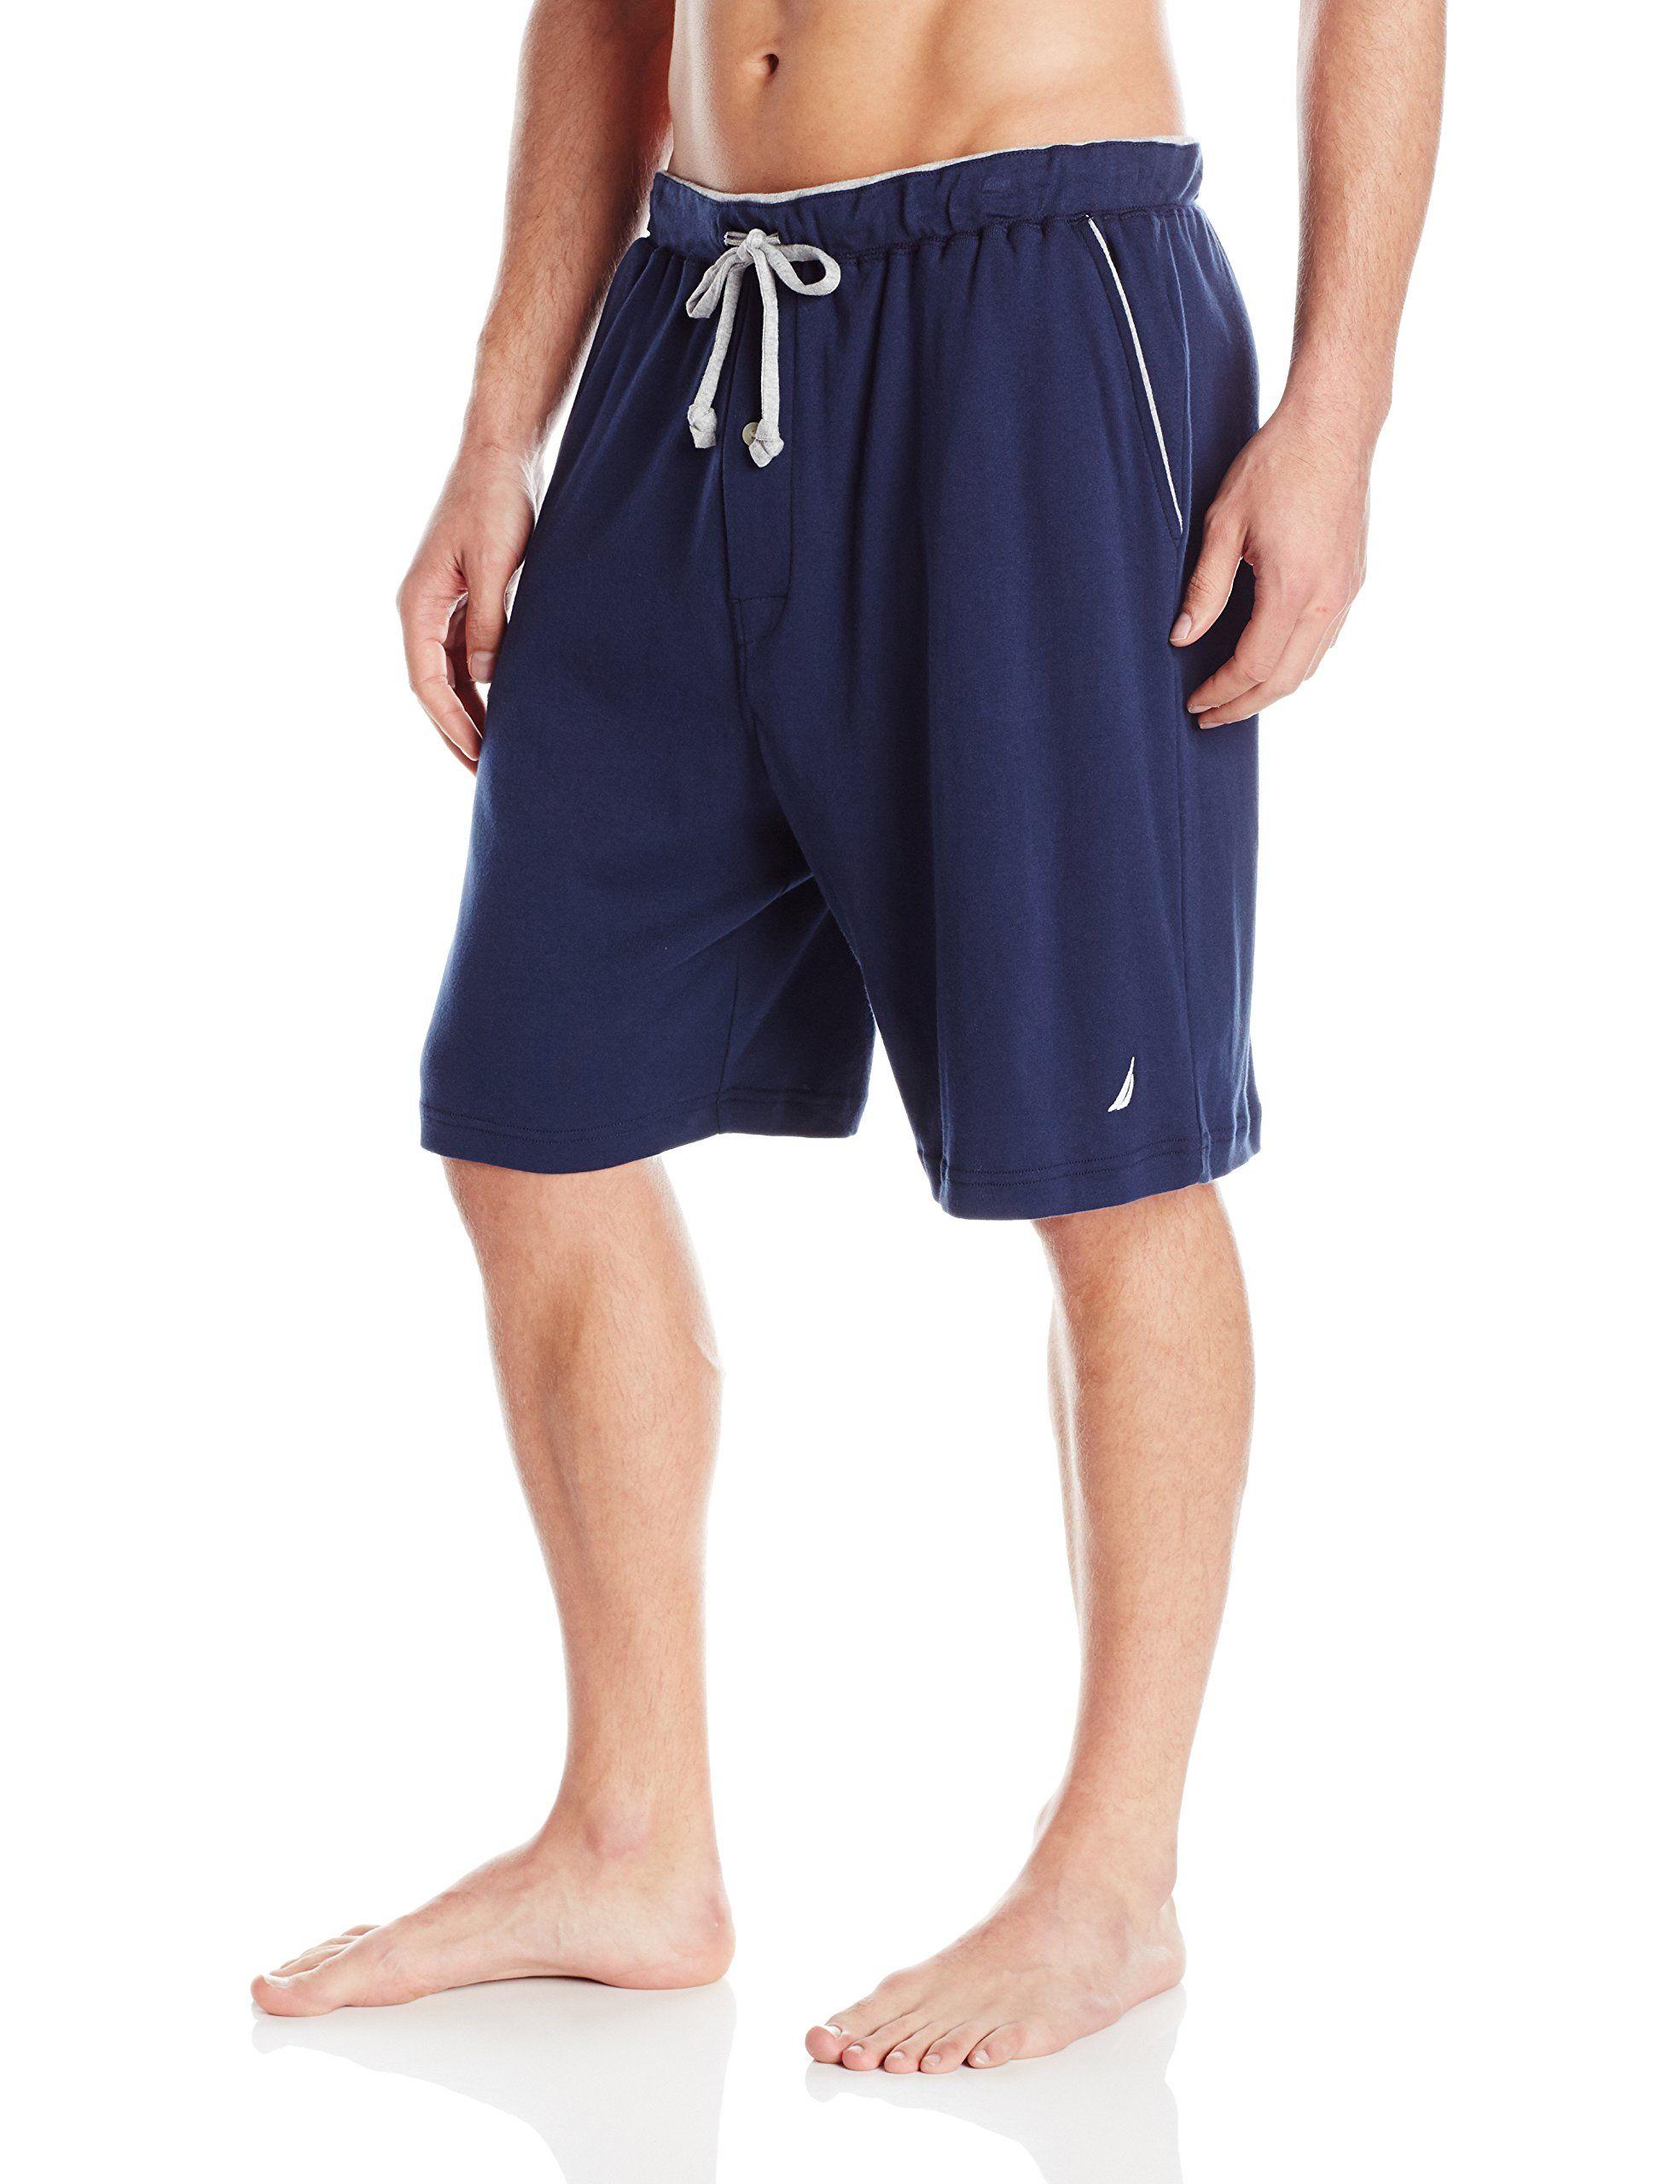 453e9ae371 Nautica Men s Knit Sleep Short